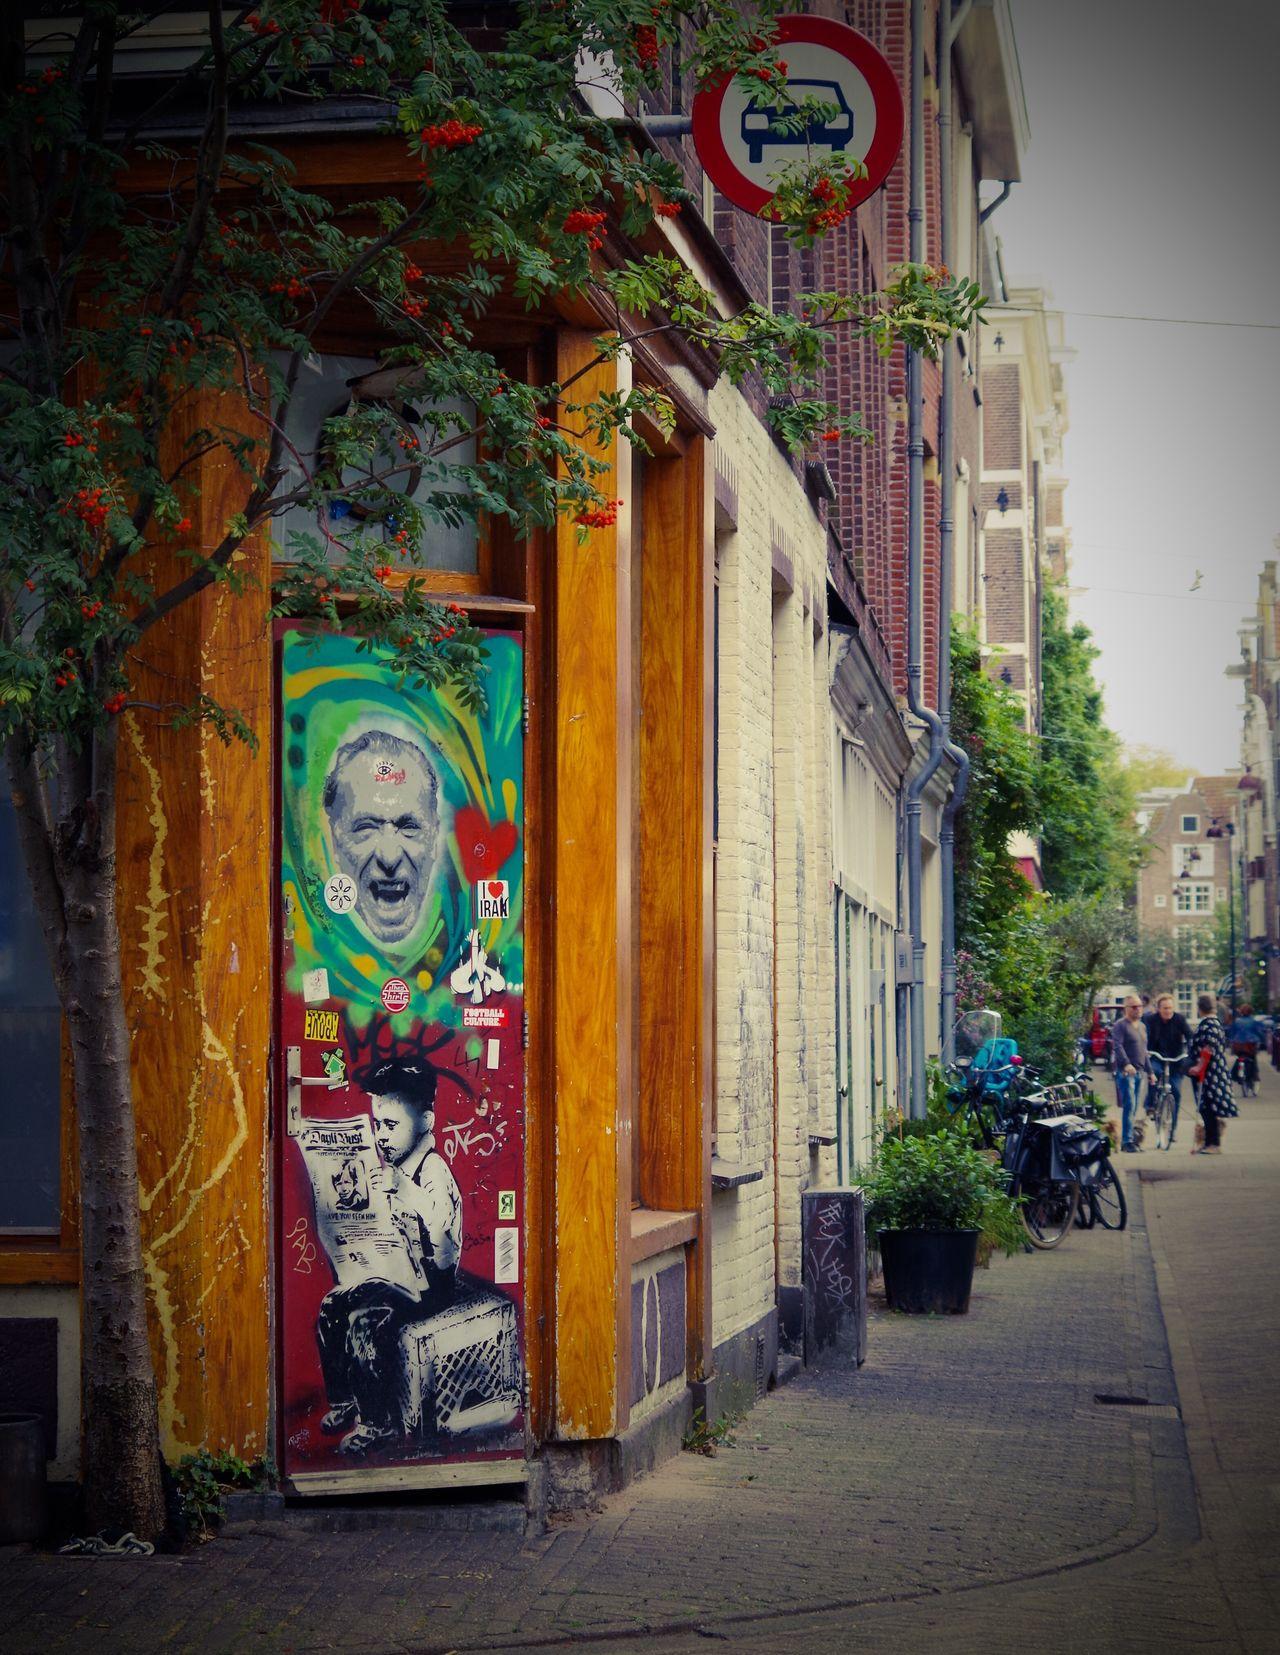 Streetphotography Streetart Human Representation City Amsterdam Door